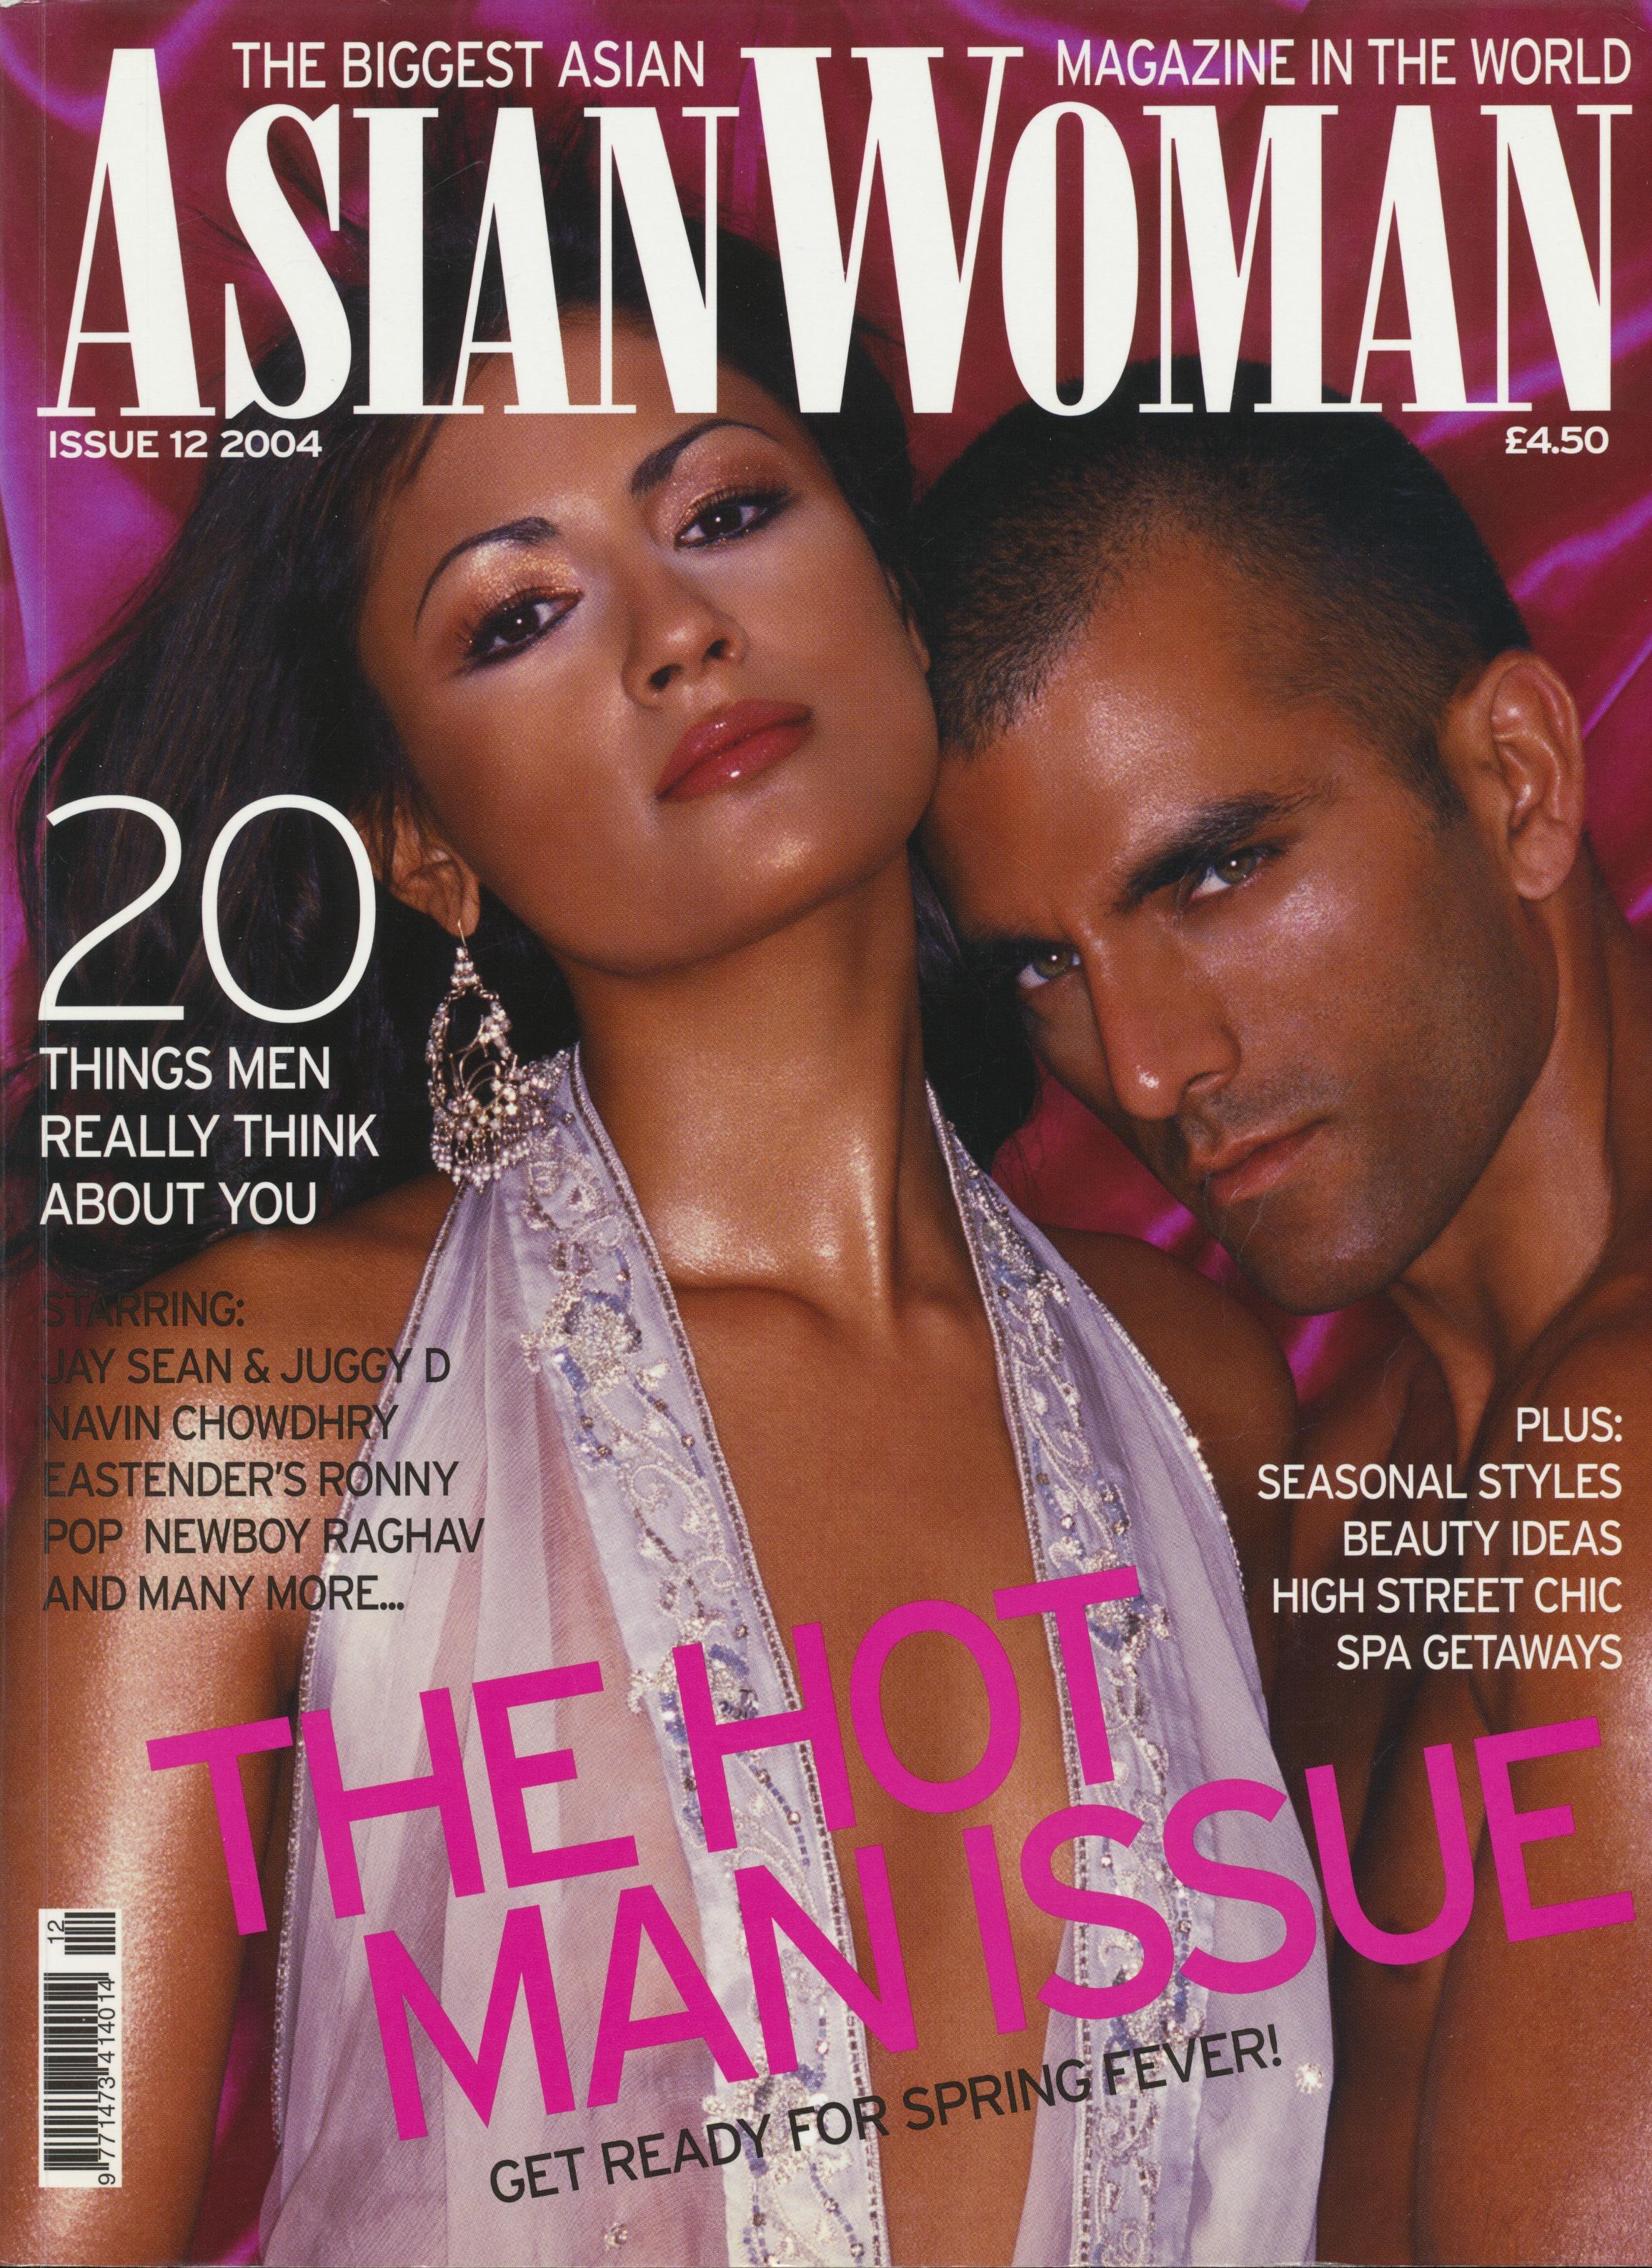 aruna_shields_asian_woman_magazine_cover.jpg